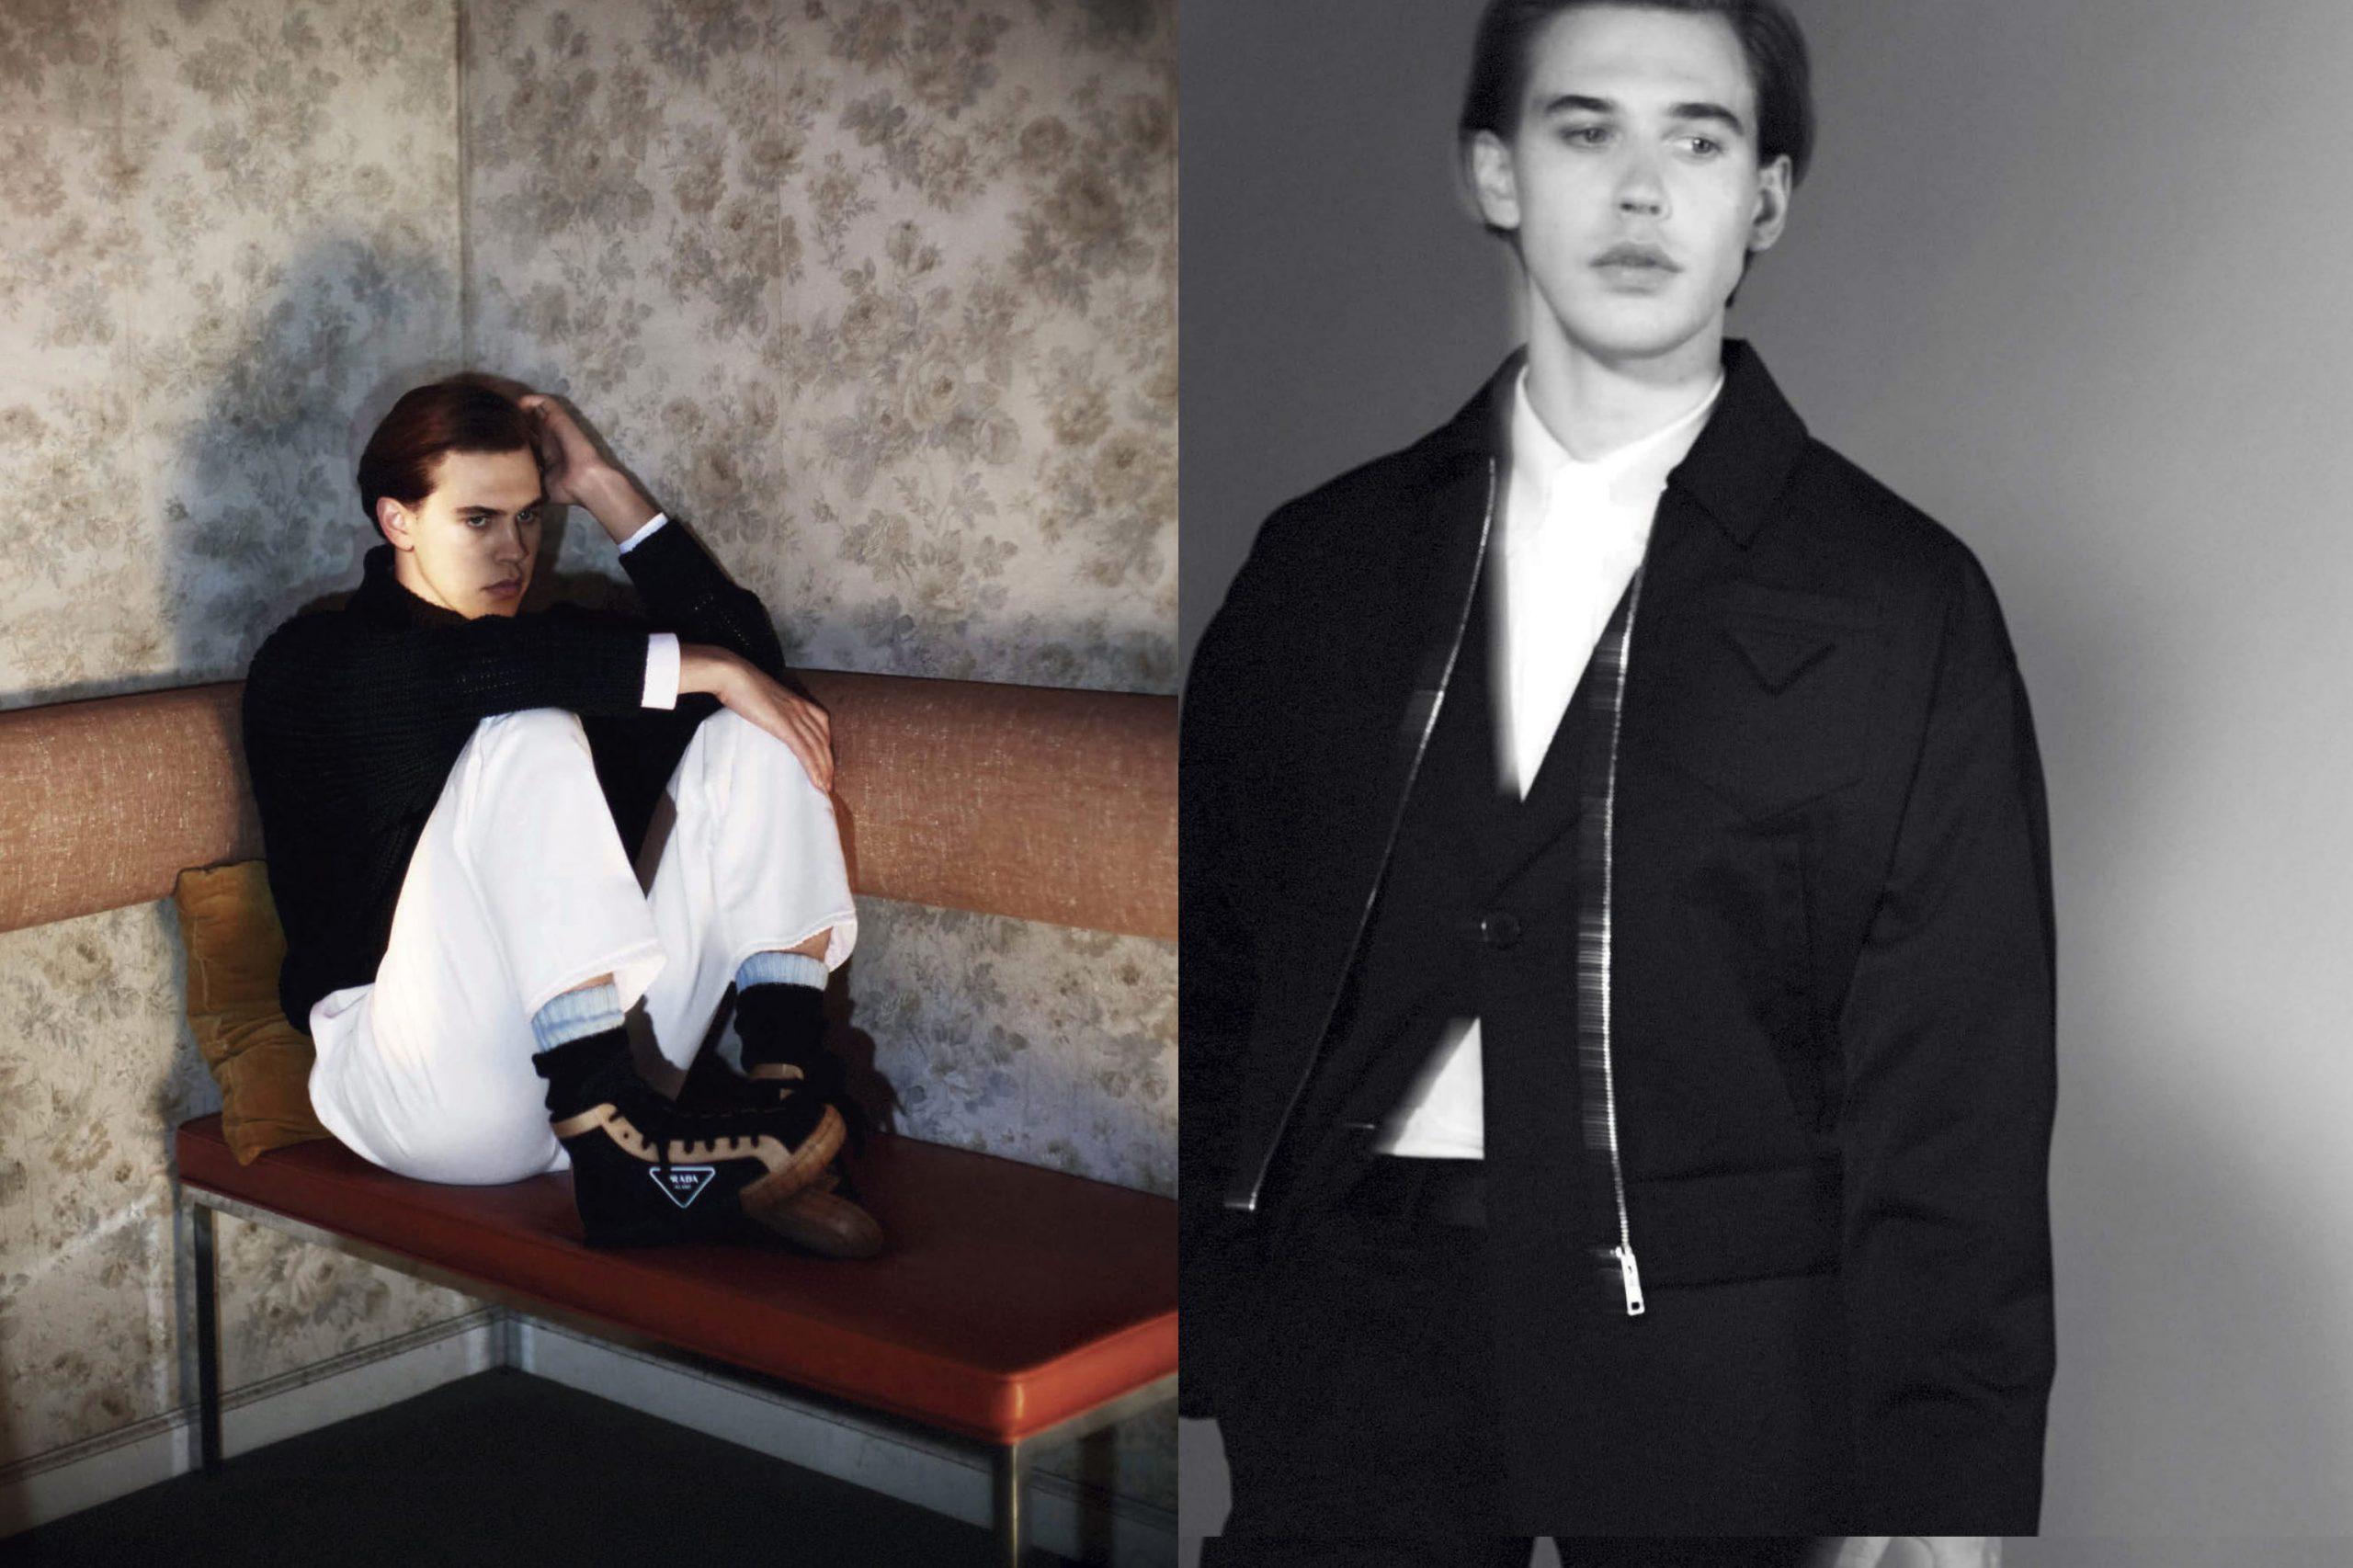 Prada Spring 2020 Men's Fashion Ad Campaign Photos